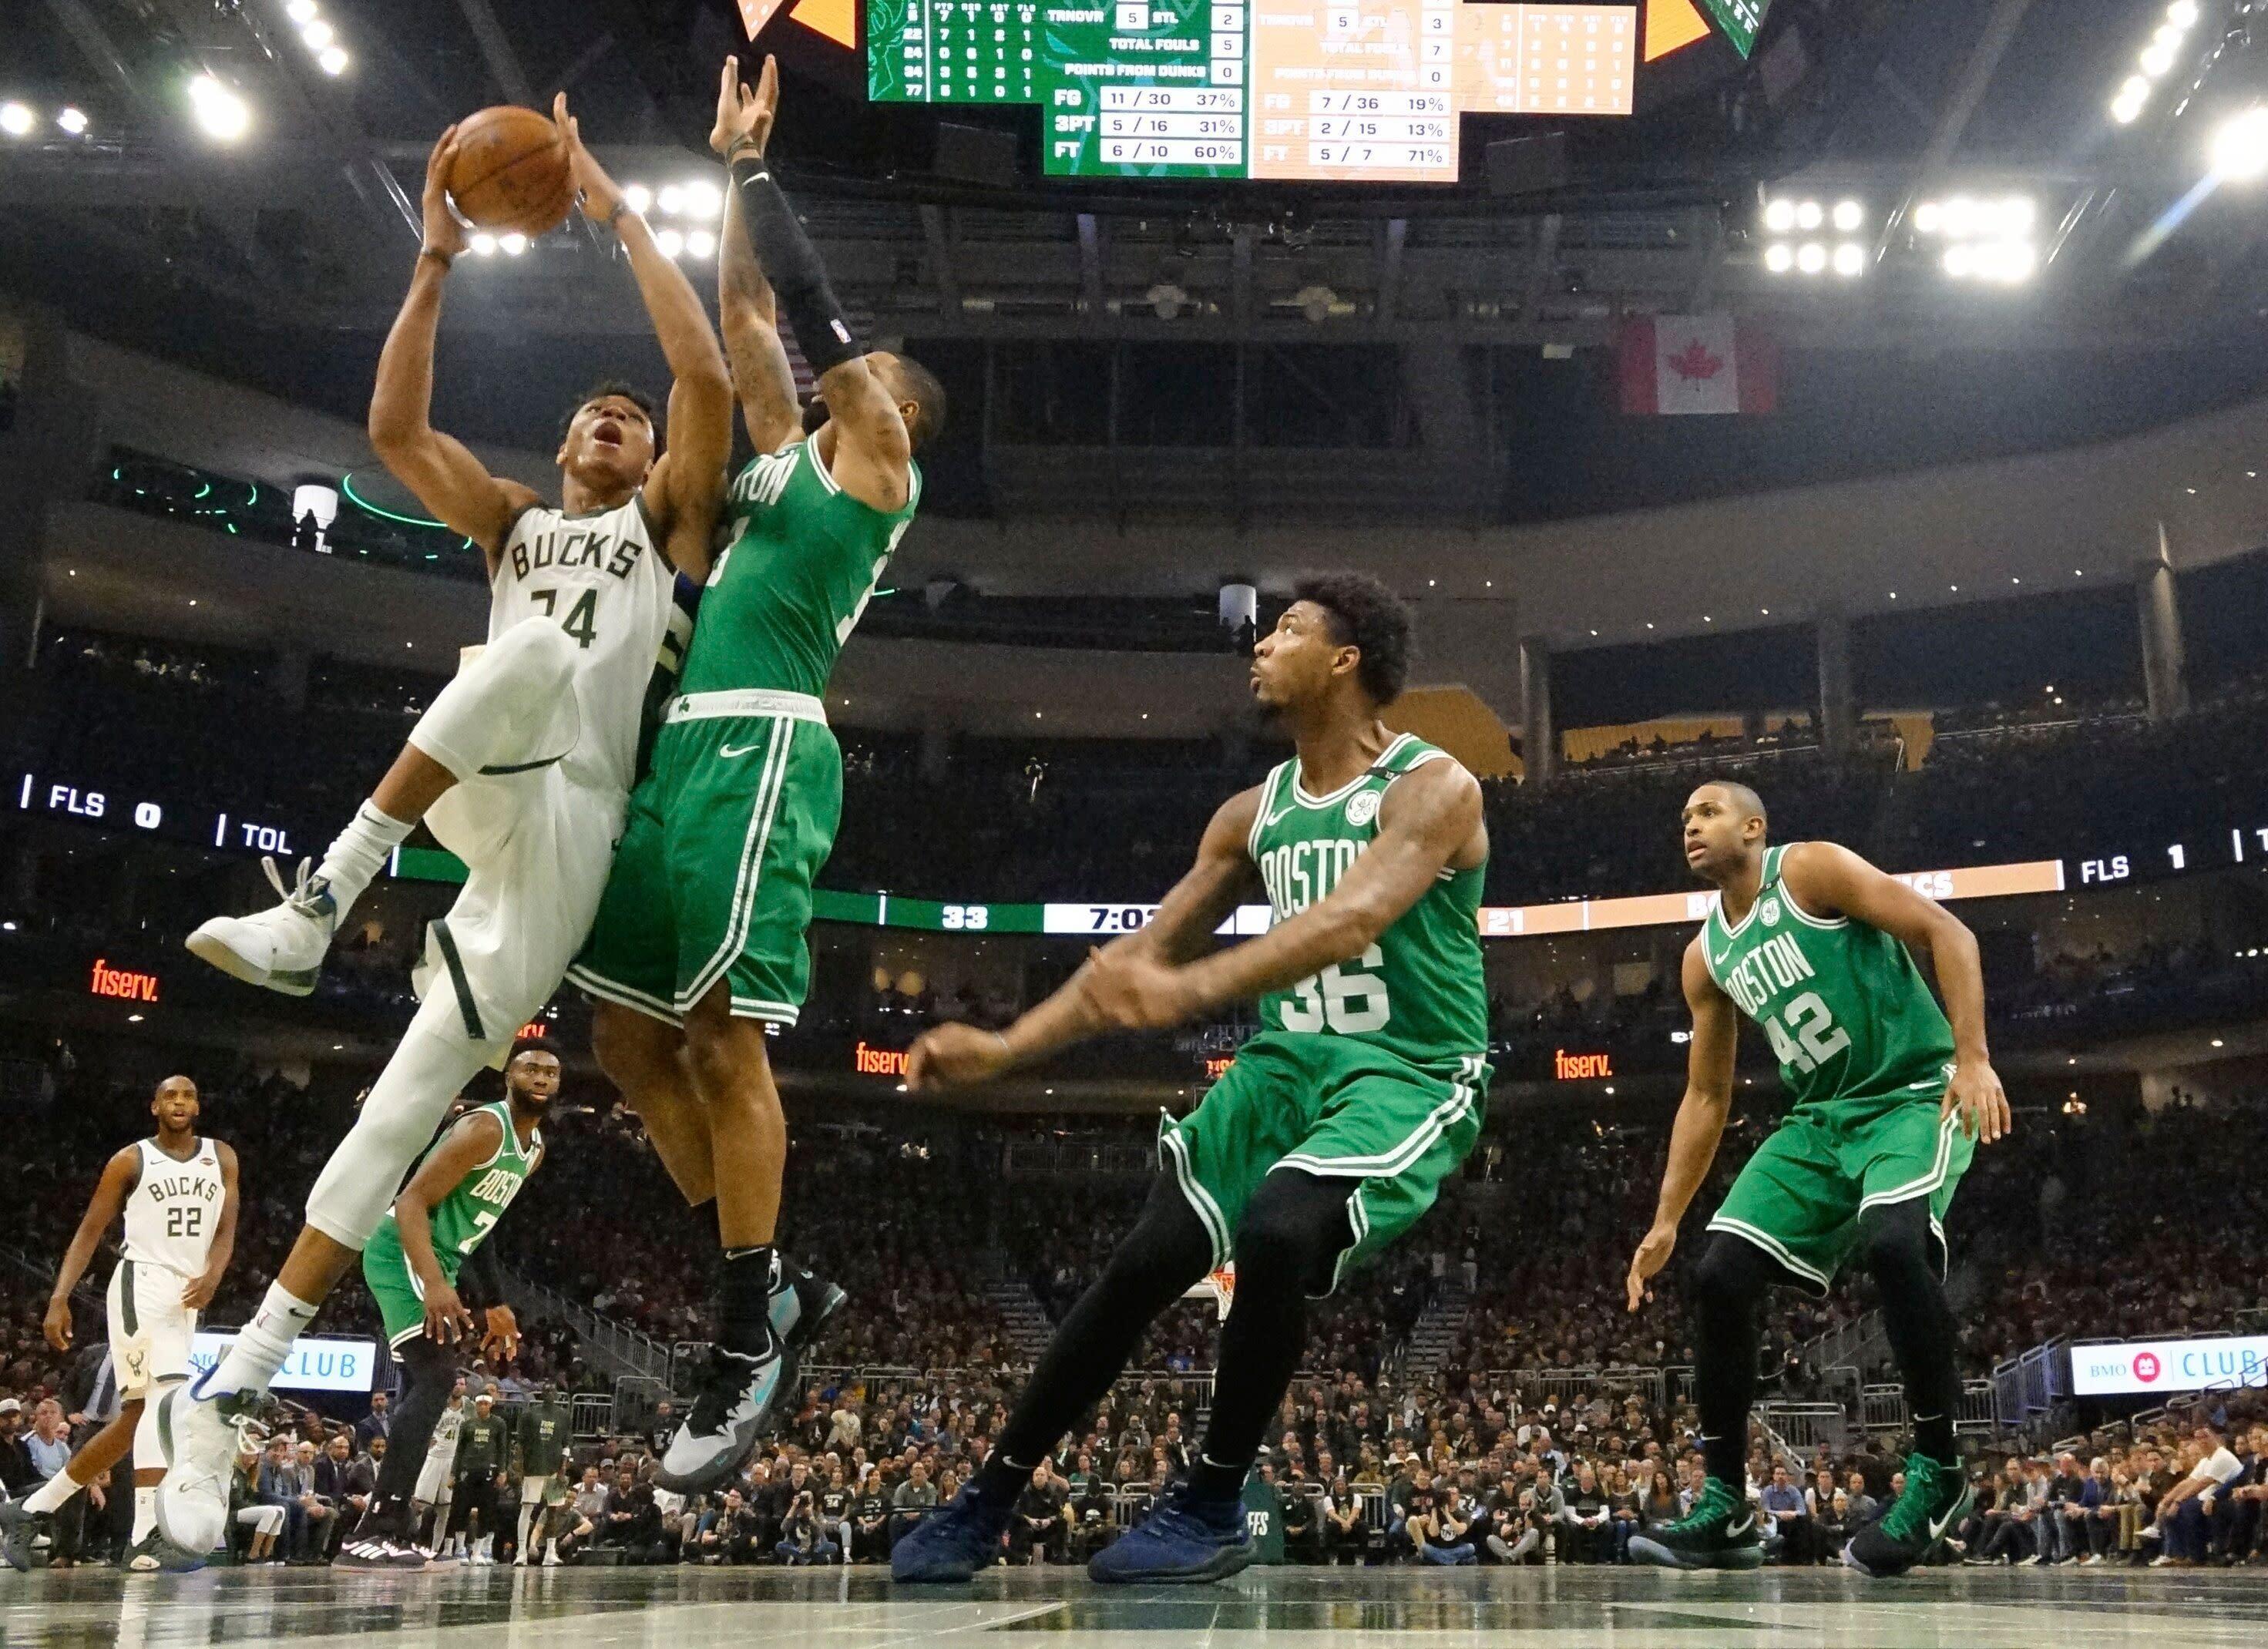 236dce19b4a Bucks mercifully end Celtics' season with Game 5 stomping. Jack Baer. Yahoo  Sports Contributor